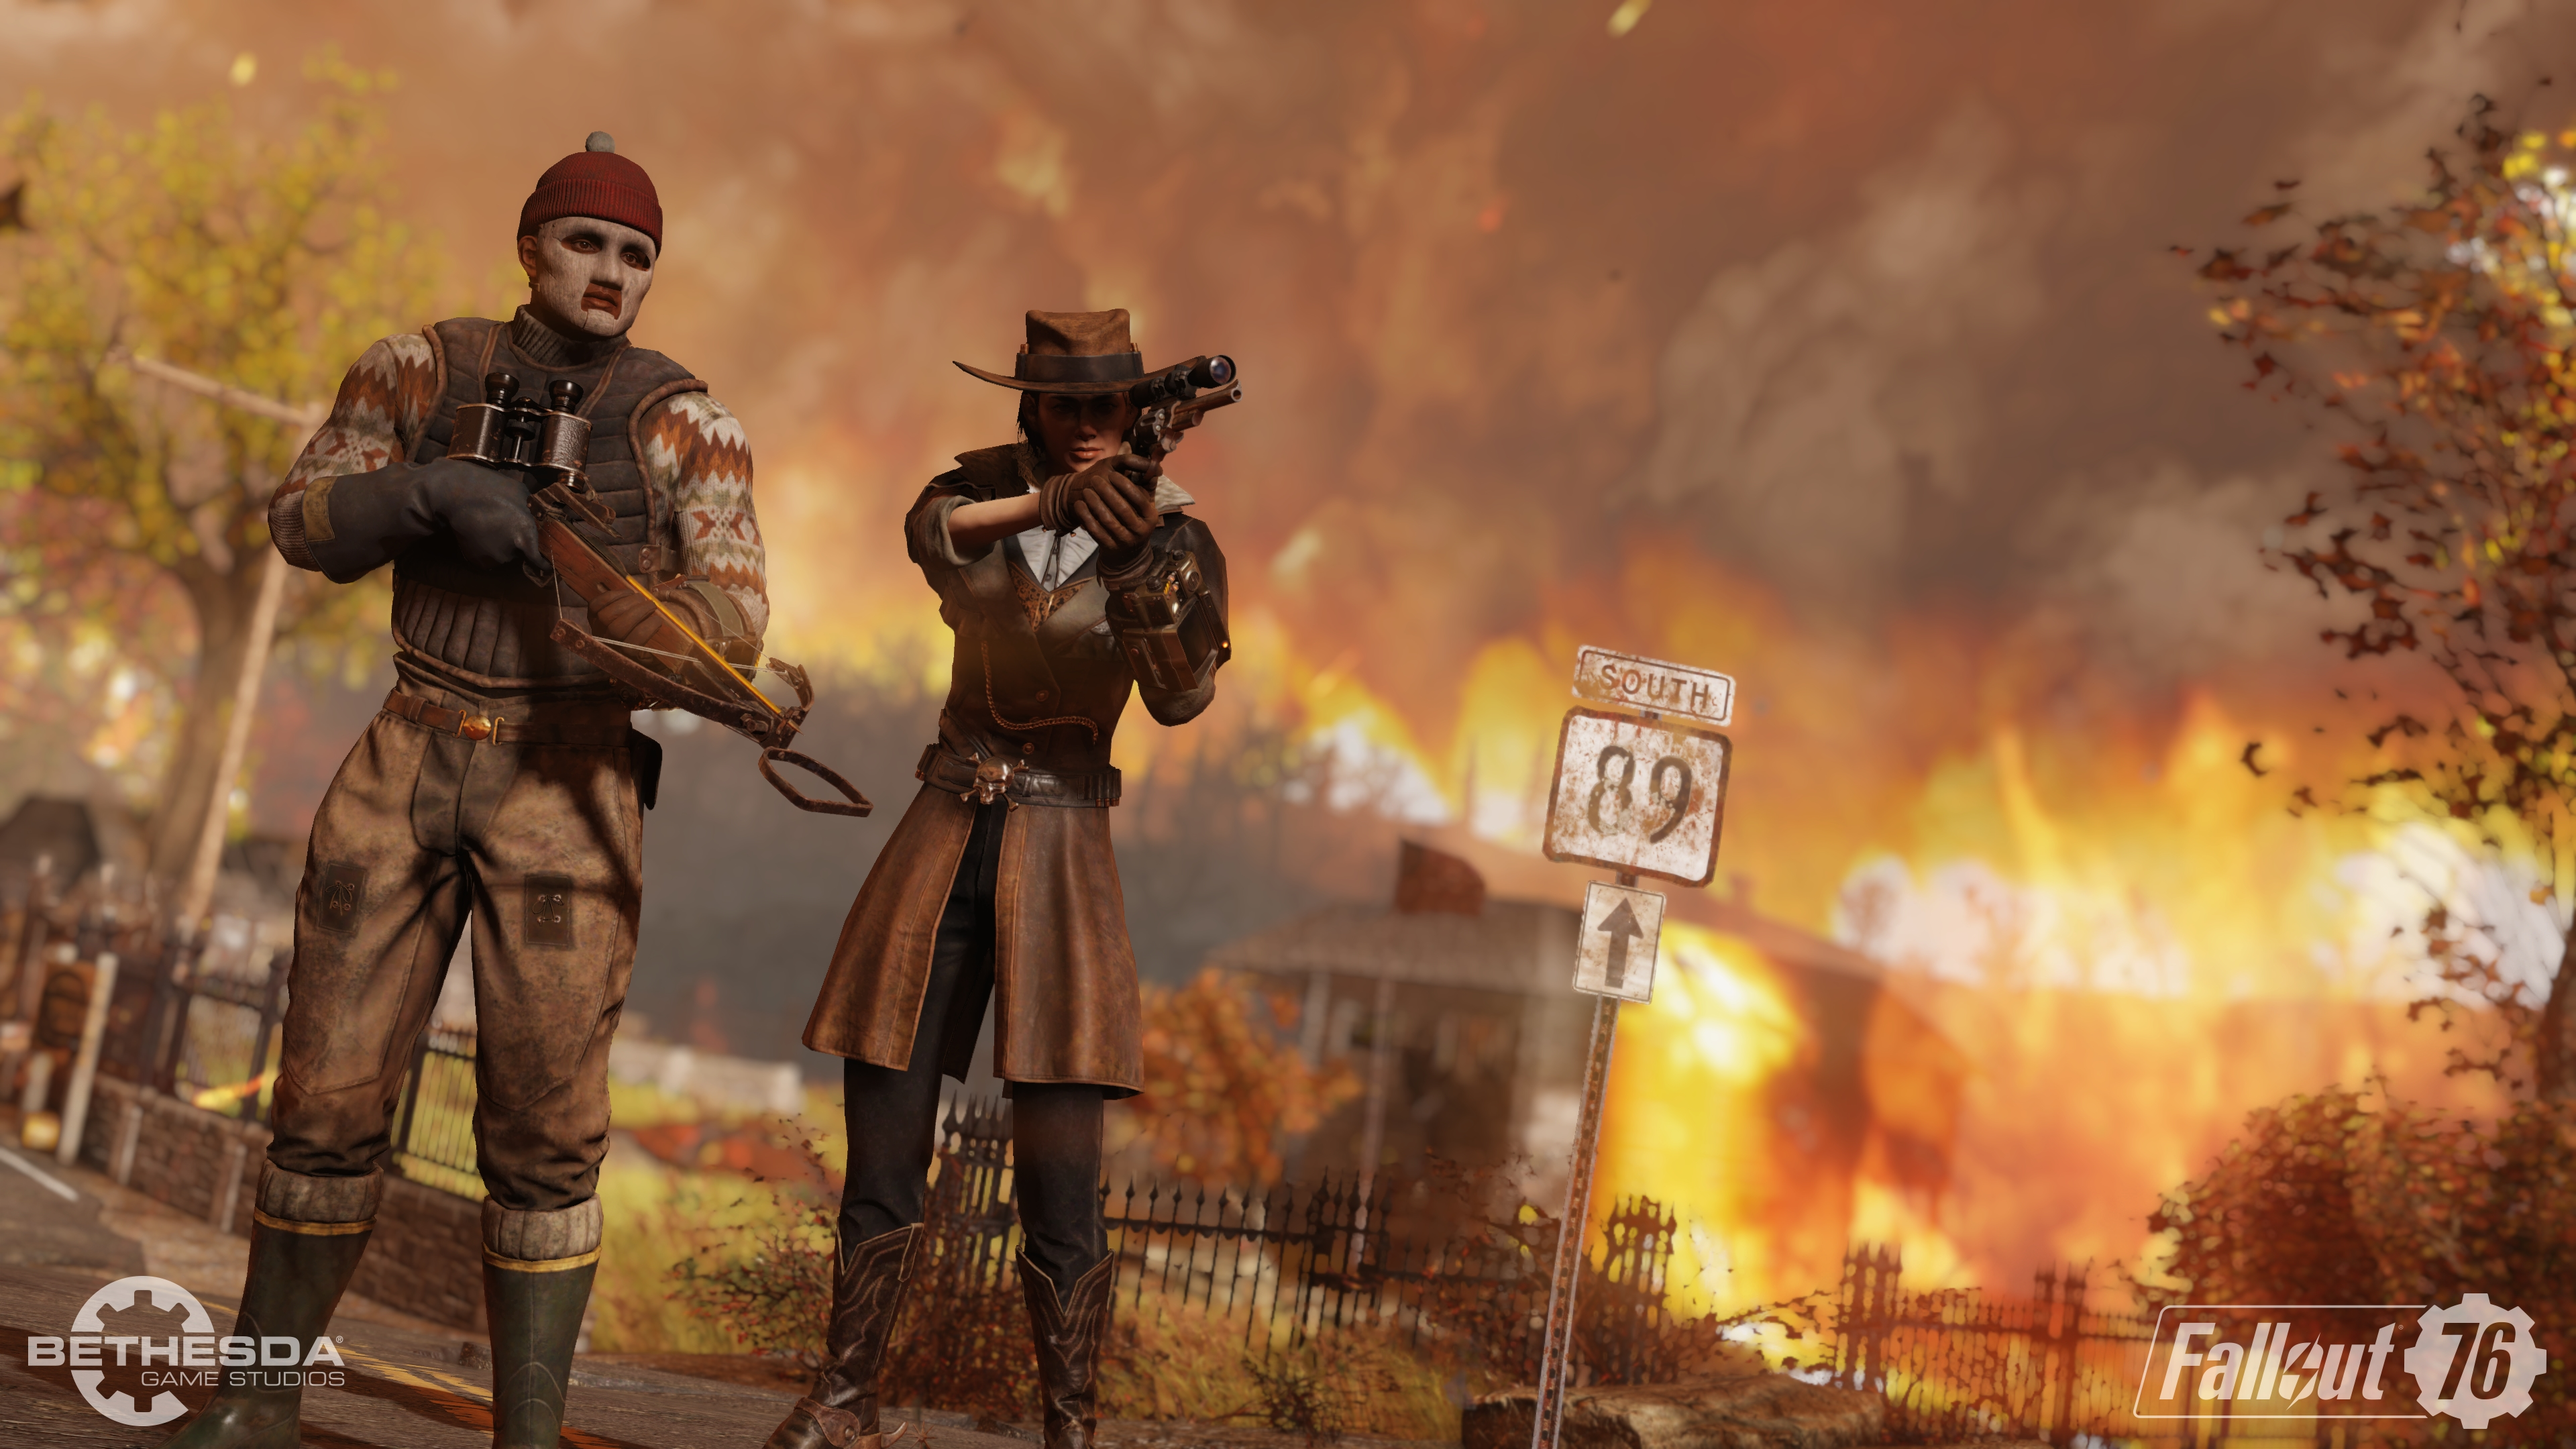 Fallout 76 Nuclear Winter pre-beta has been extended | TechRadar